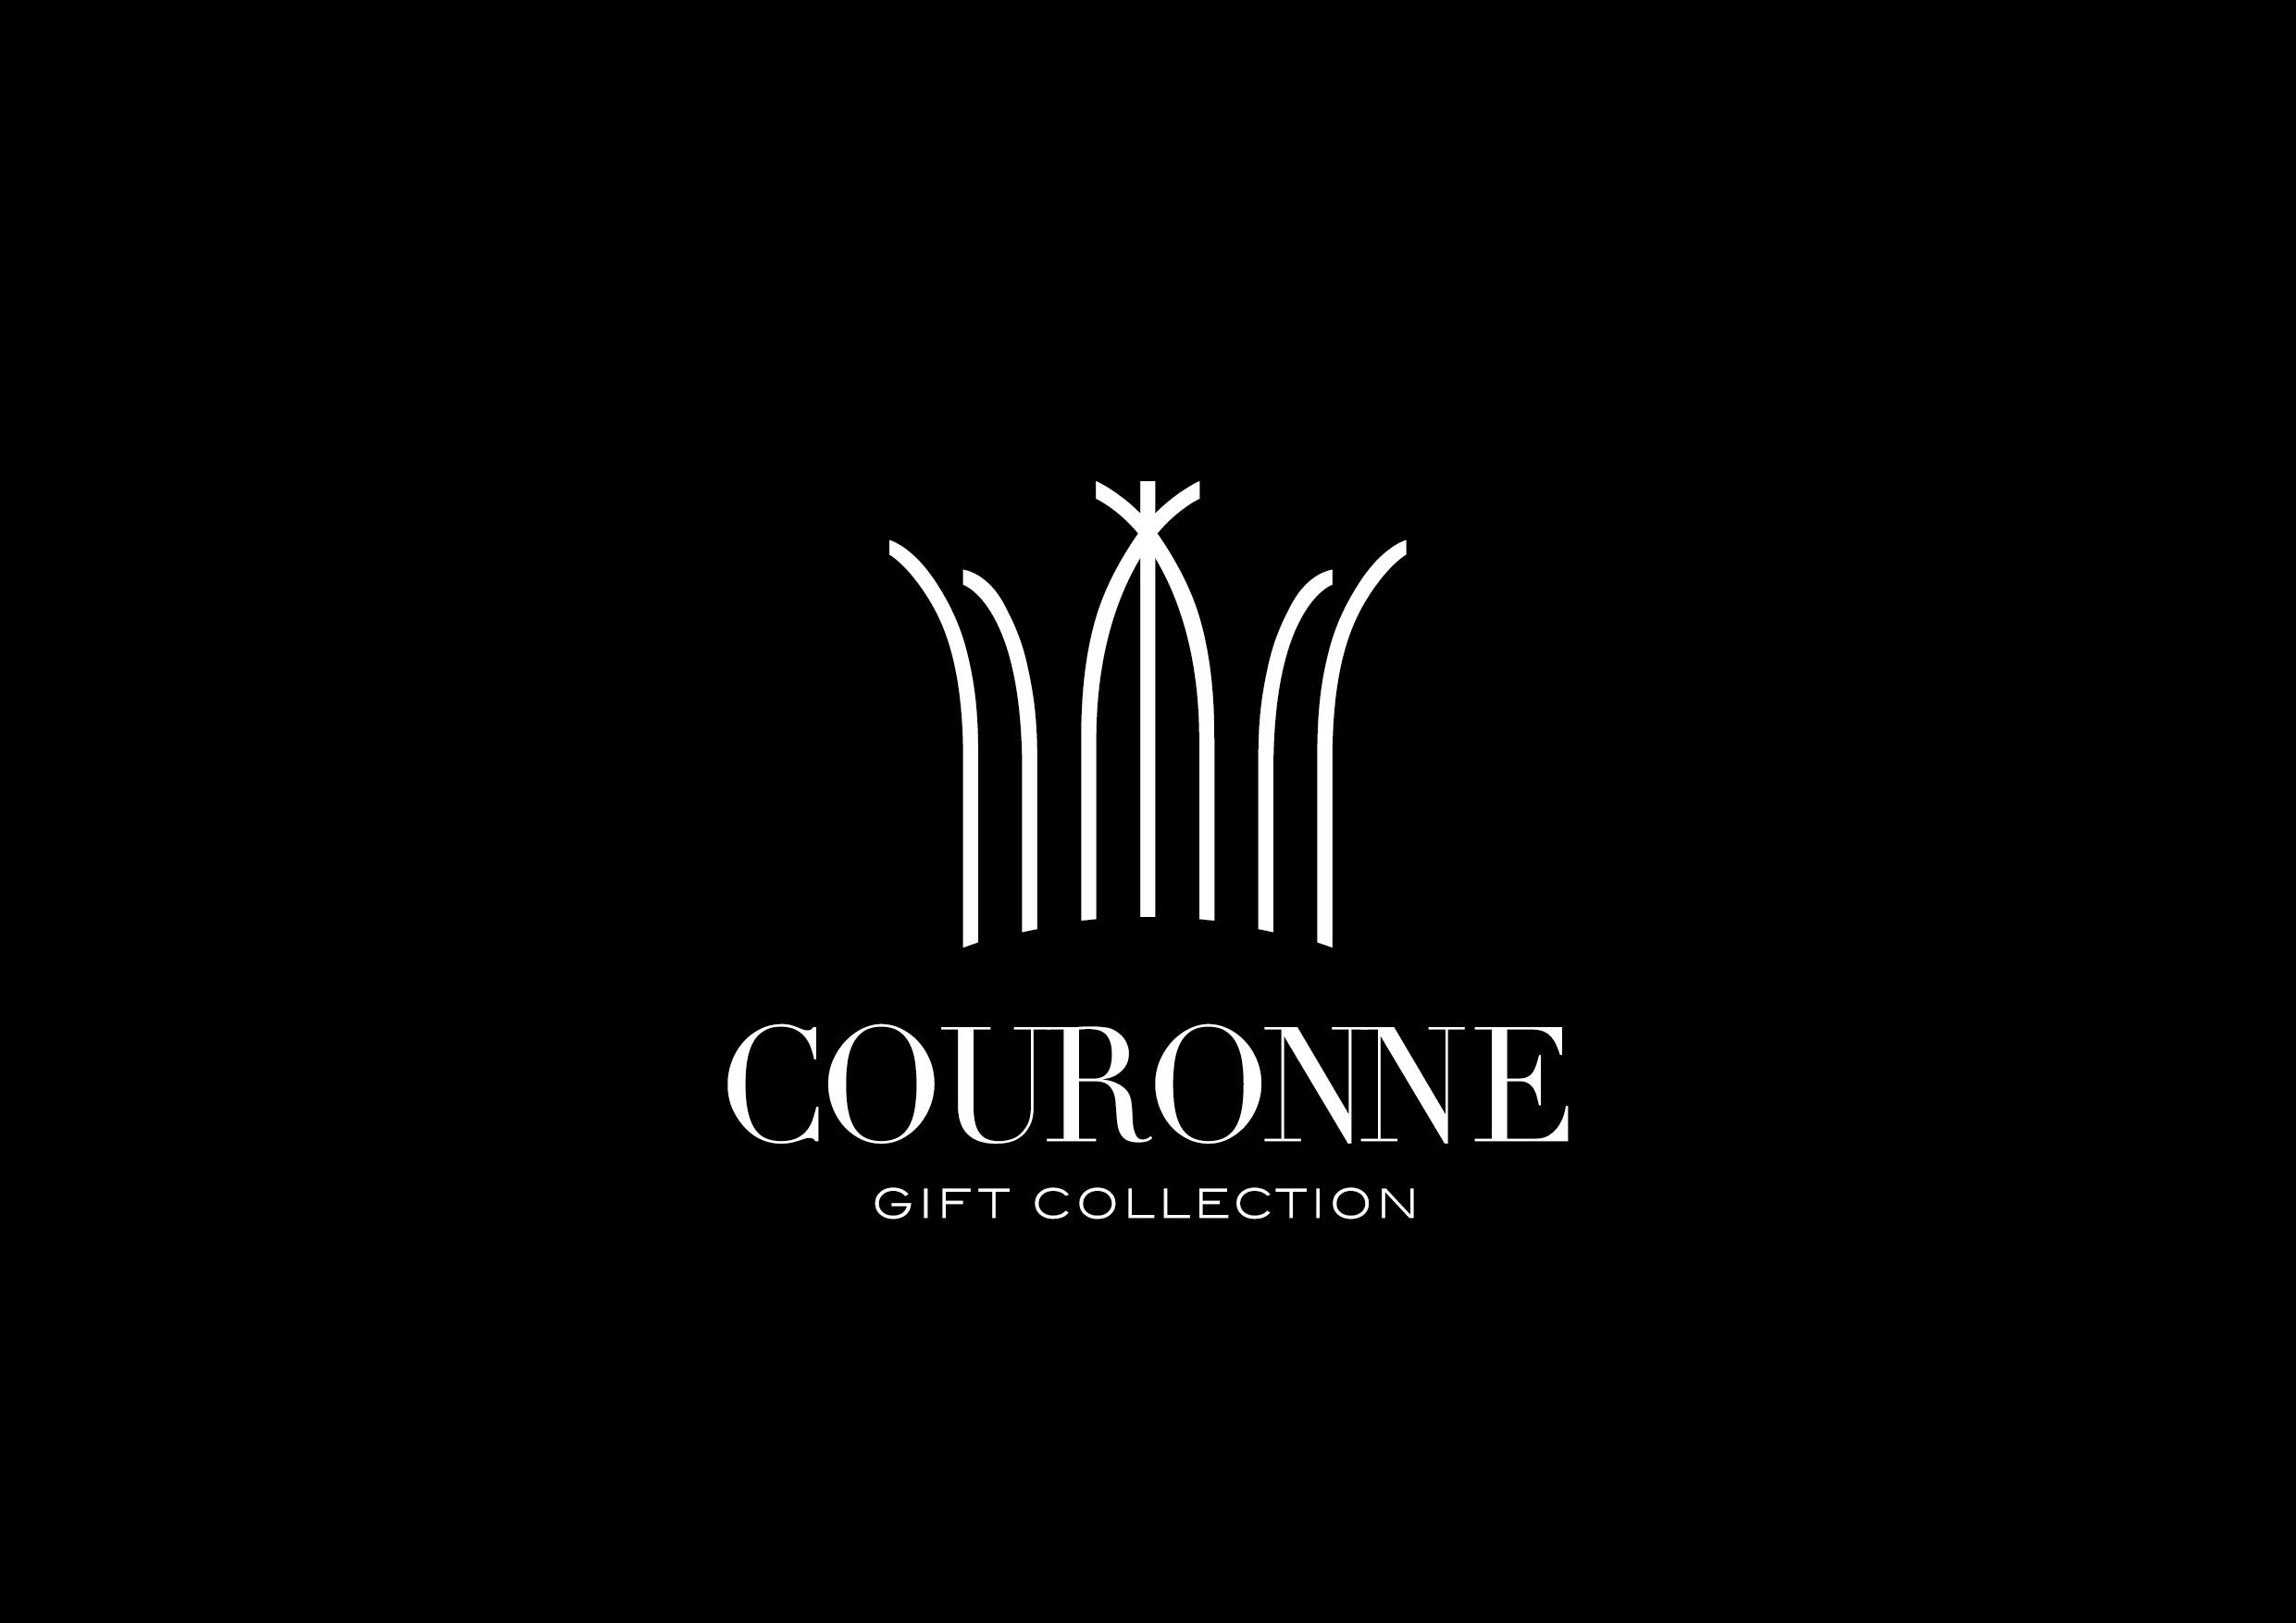 0416-COURONNE guideline final-06.jpg